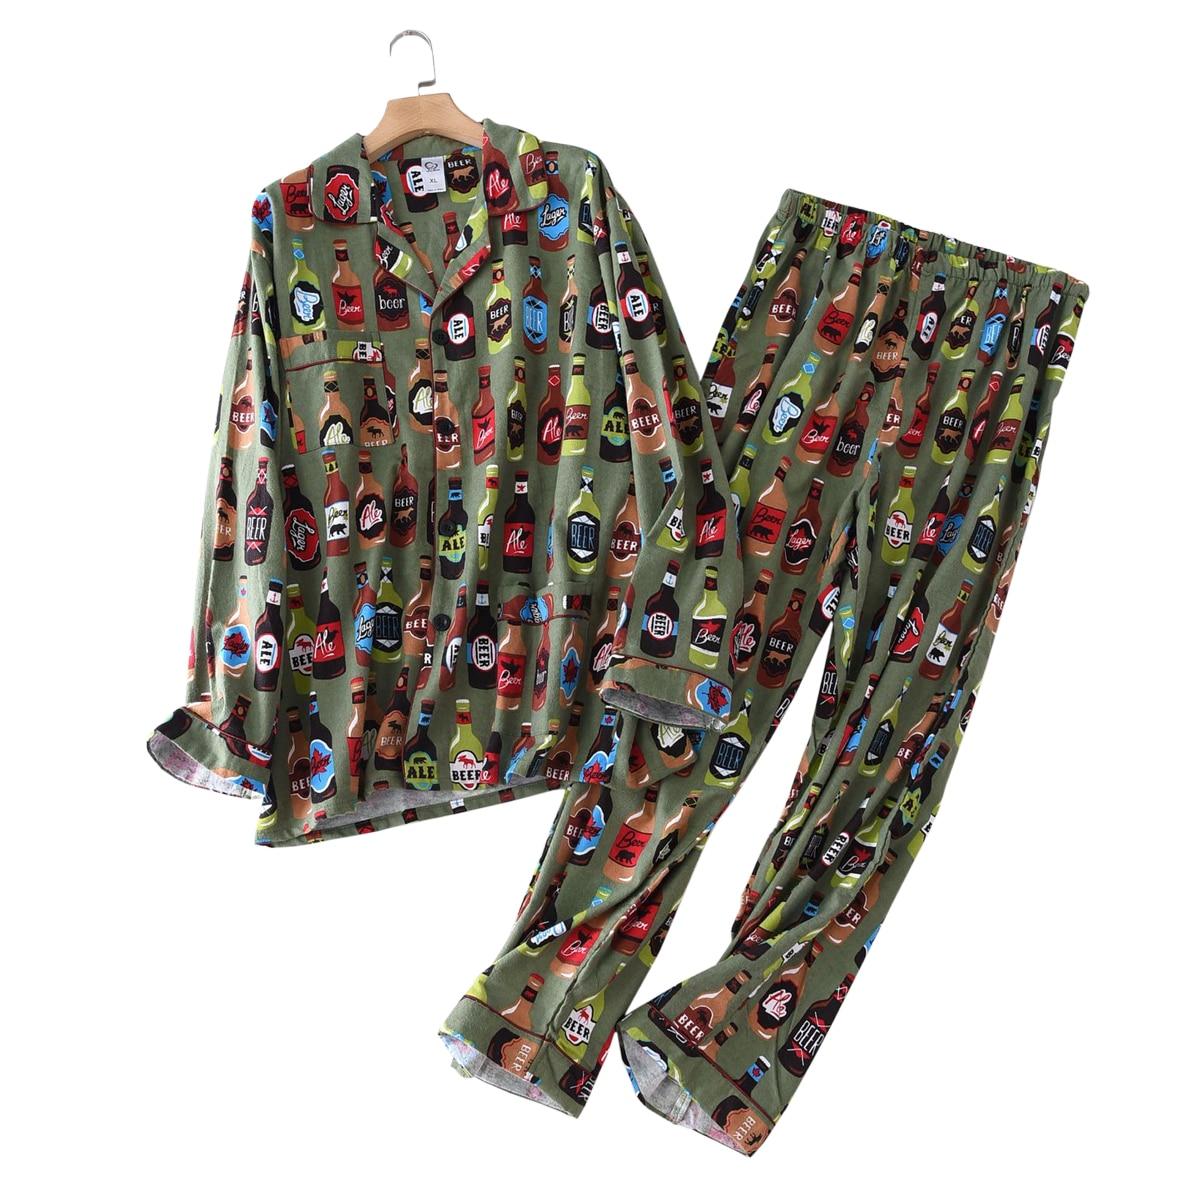 New Spring Fashion Printing 100% Cotton Pajamas Sets Mens Sleepwear Casual Male Home Clothing Pyjamas Men Homewear Plus Size